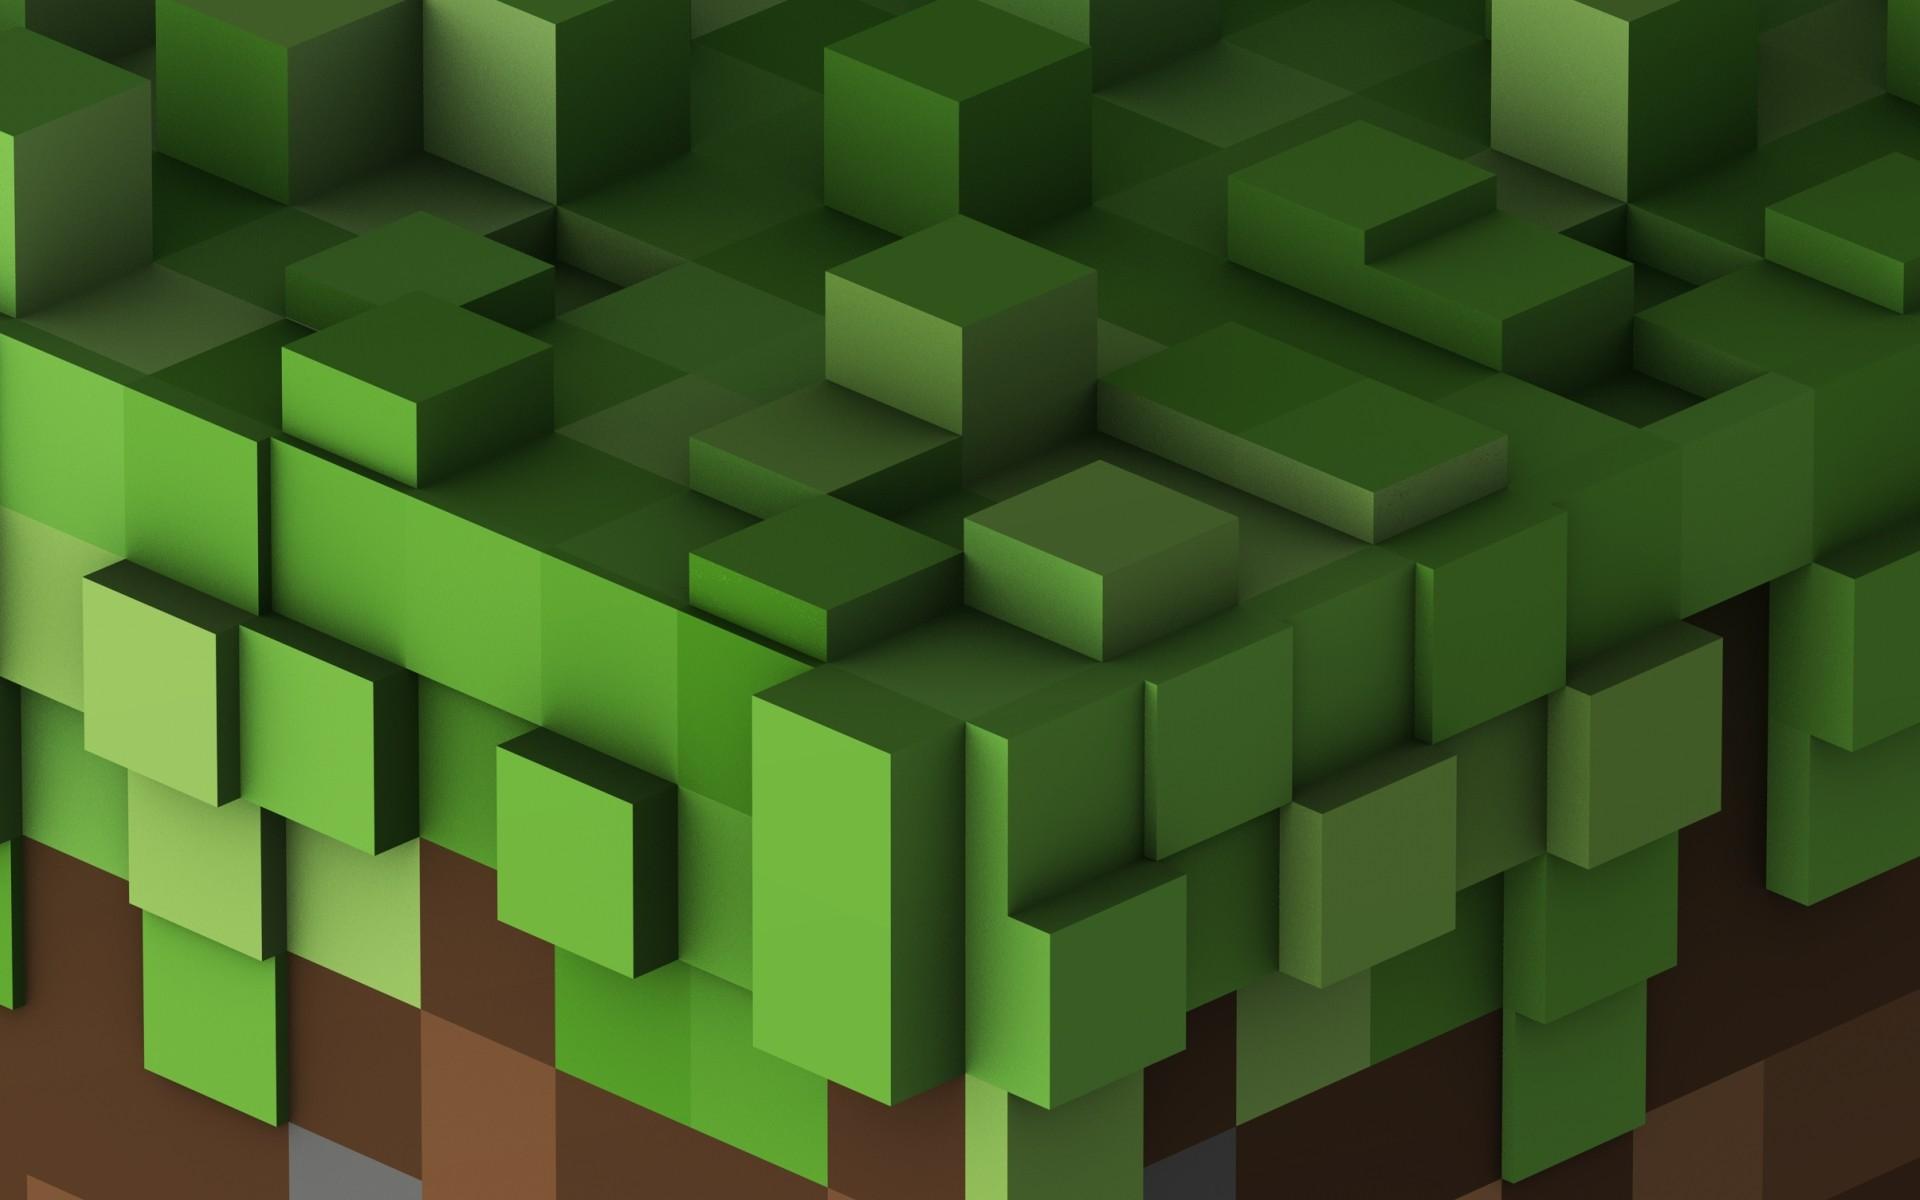 … Minecraft Wallpaper (21) …